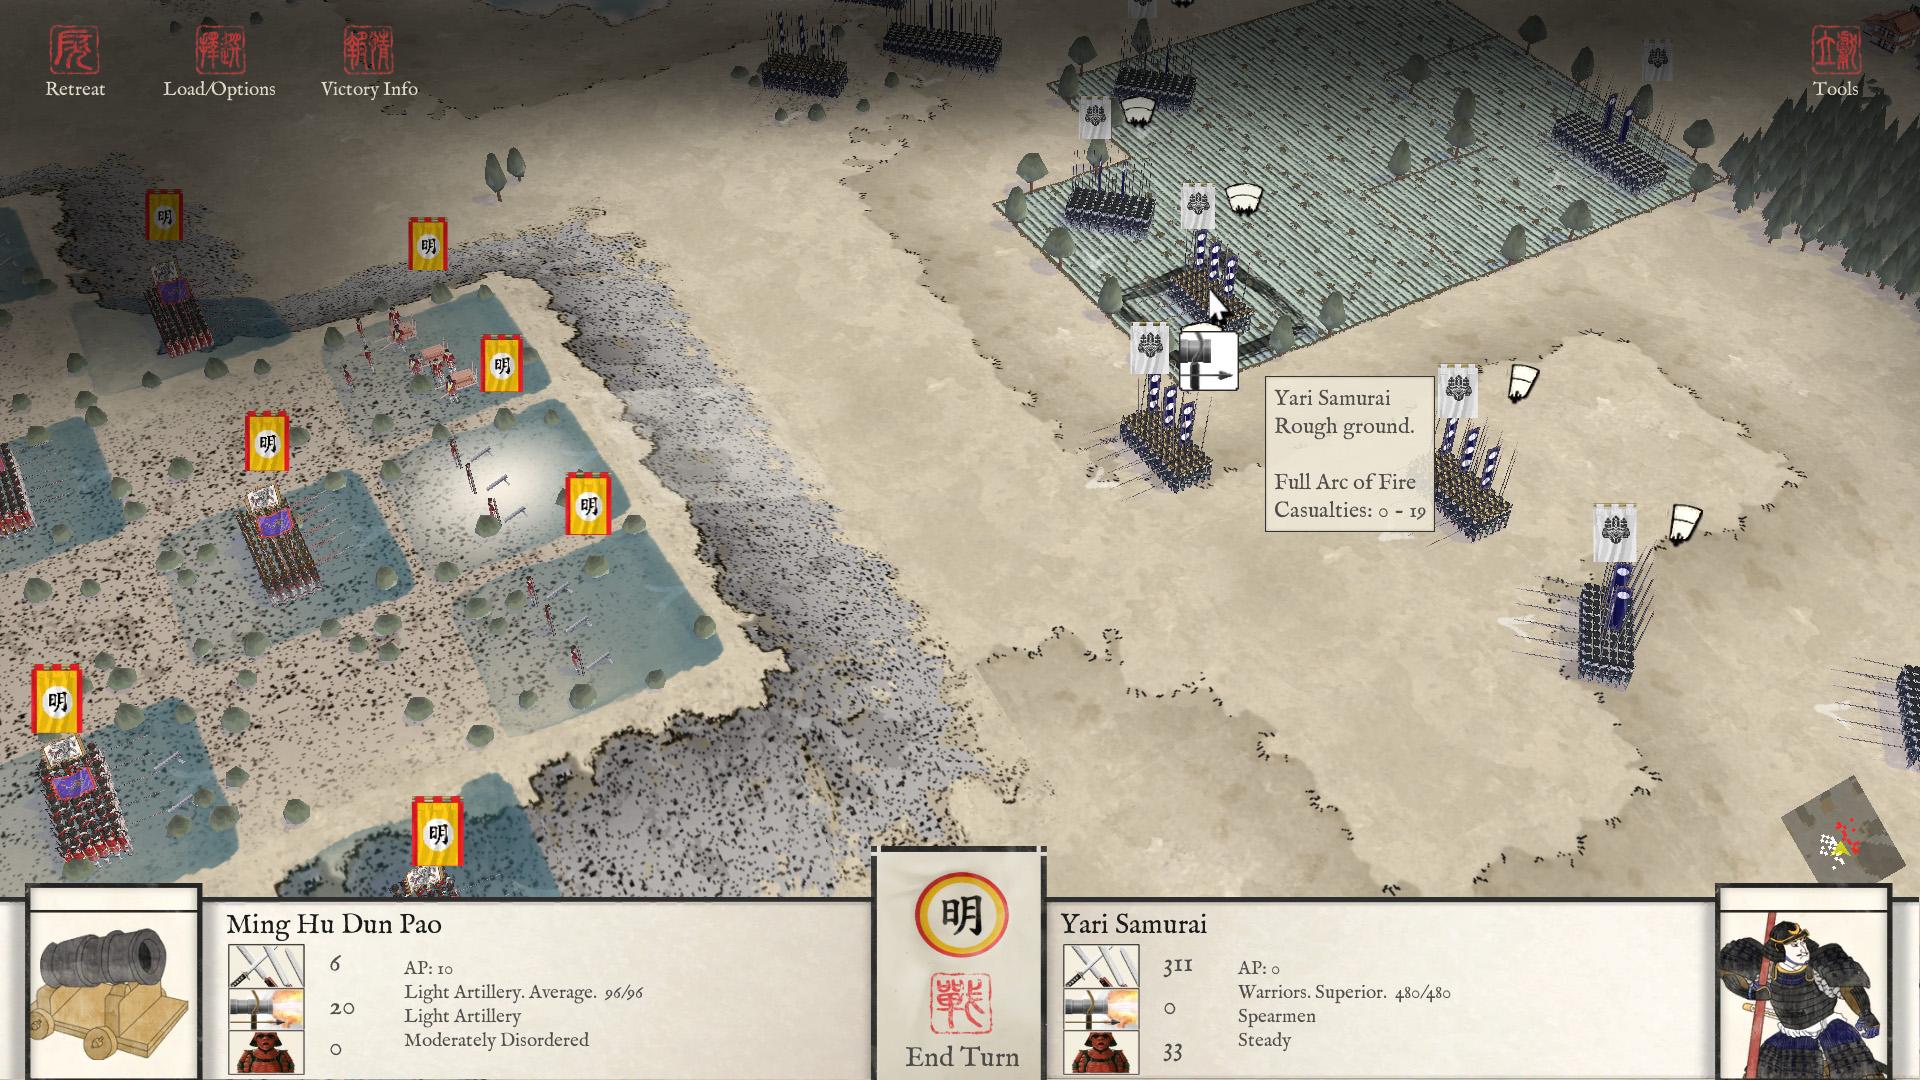 Sengoku Jidai: Shadow of the Shogun Full Free Download Screenshot 1